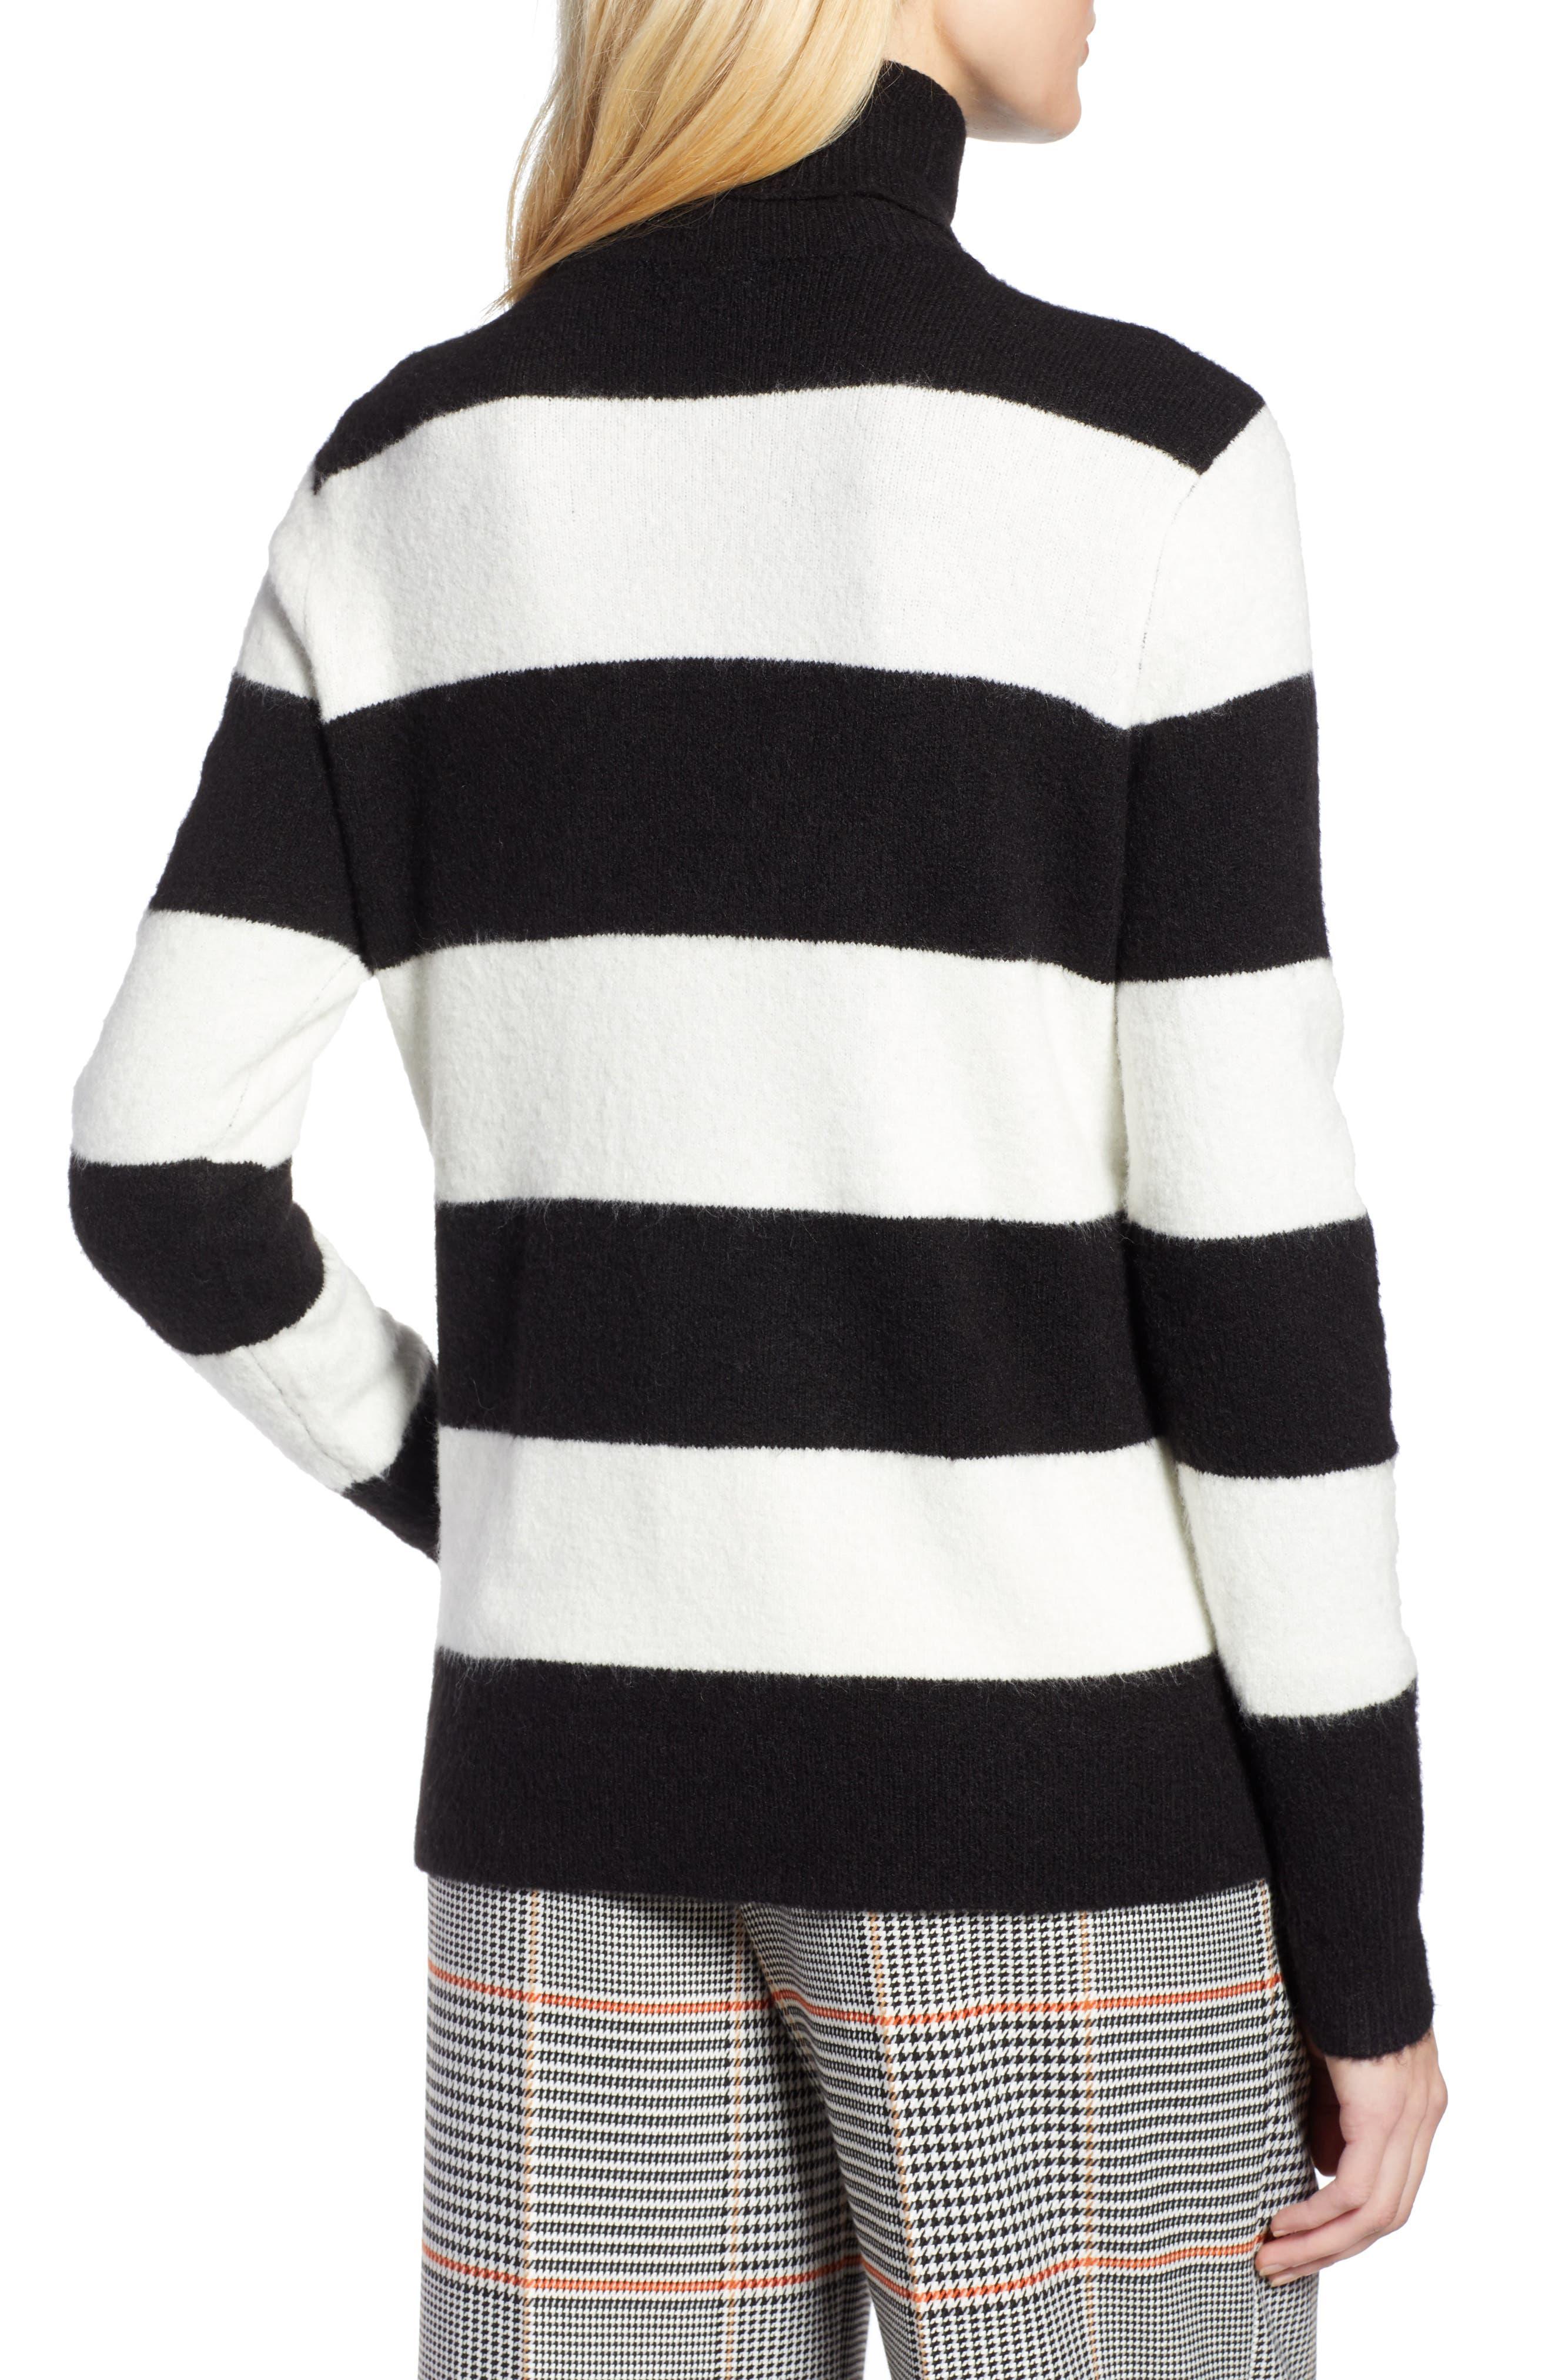 x Atlantic-Pacific Stripe Turtleneck Sweater,                             Alternate thumbnail 3, color,                             BLACK- IVORY STRIPE